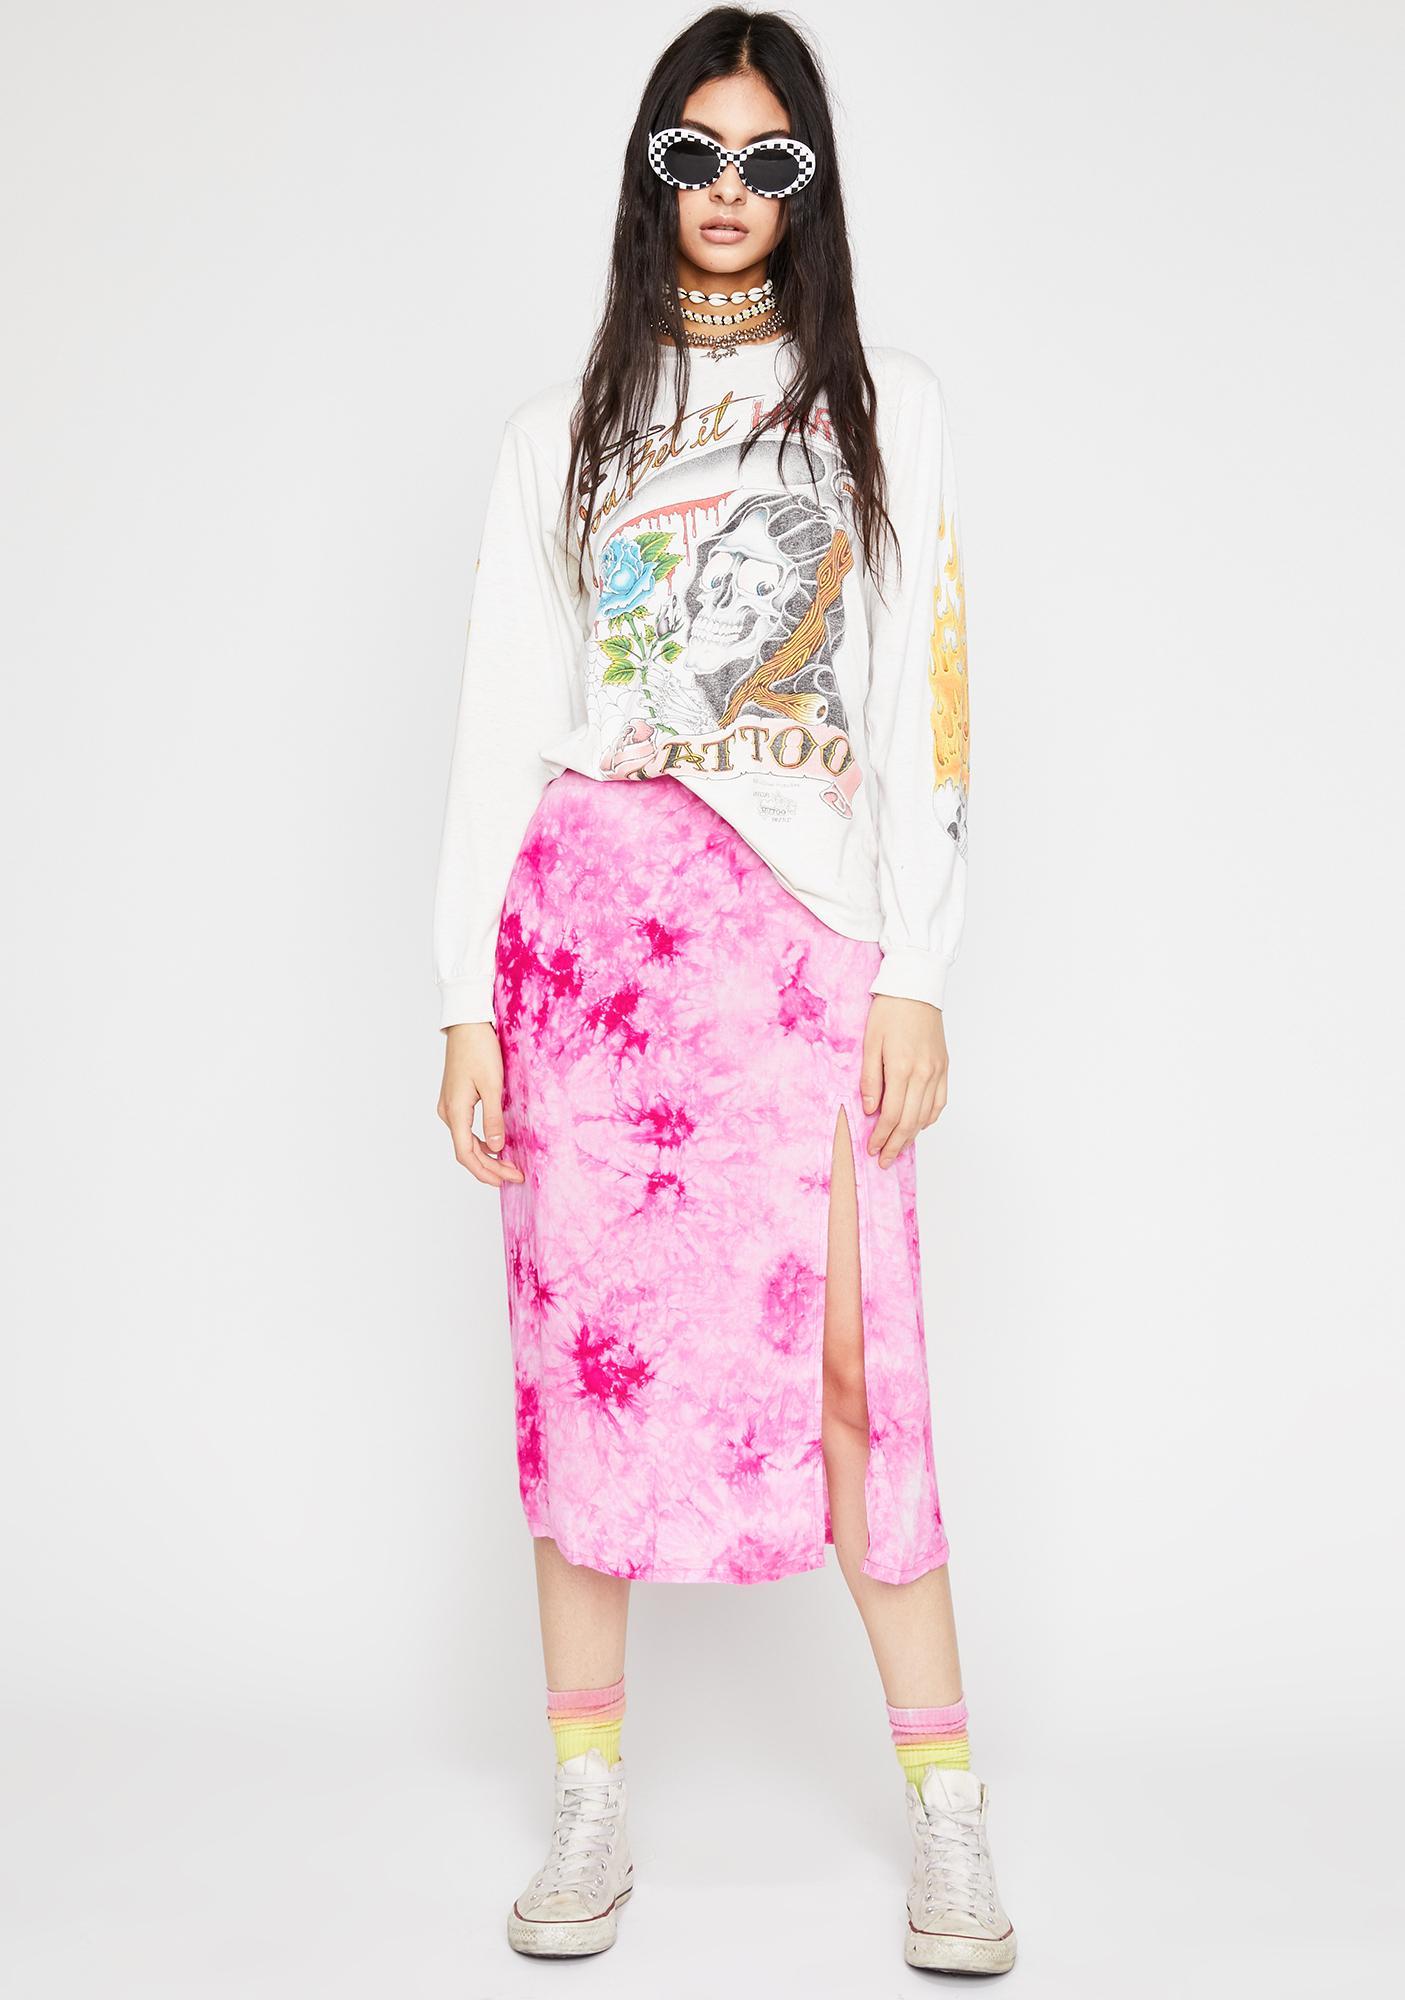 Catch My Vibe Tie Dye Skirt